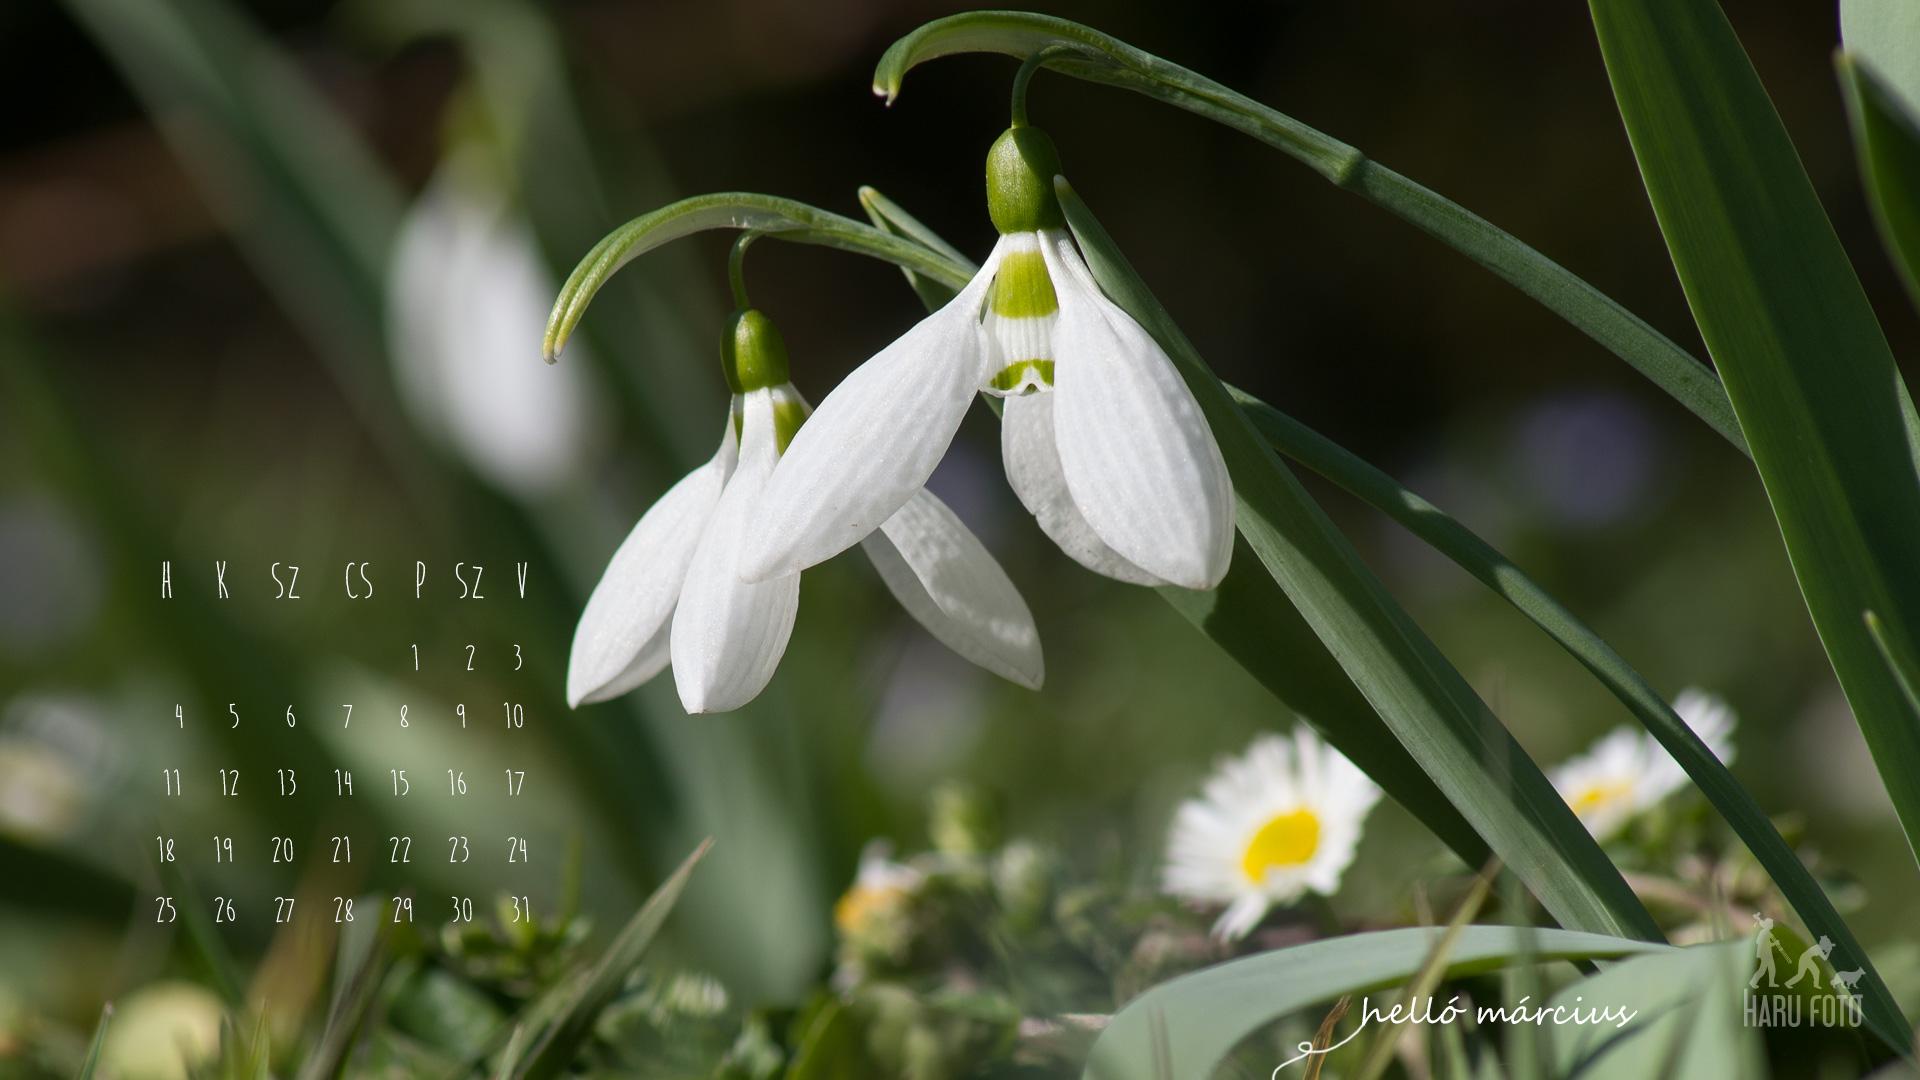 februári naptár háttérkép 2013 márciusi naptár, hóvirág háttér | Harufoto a kreatív műhely februári naptár háttérkép